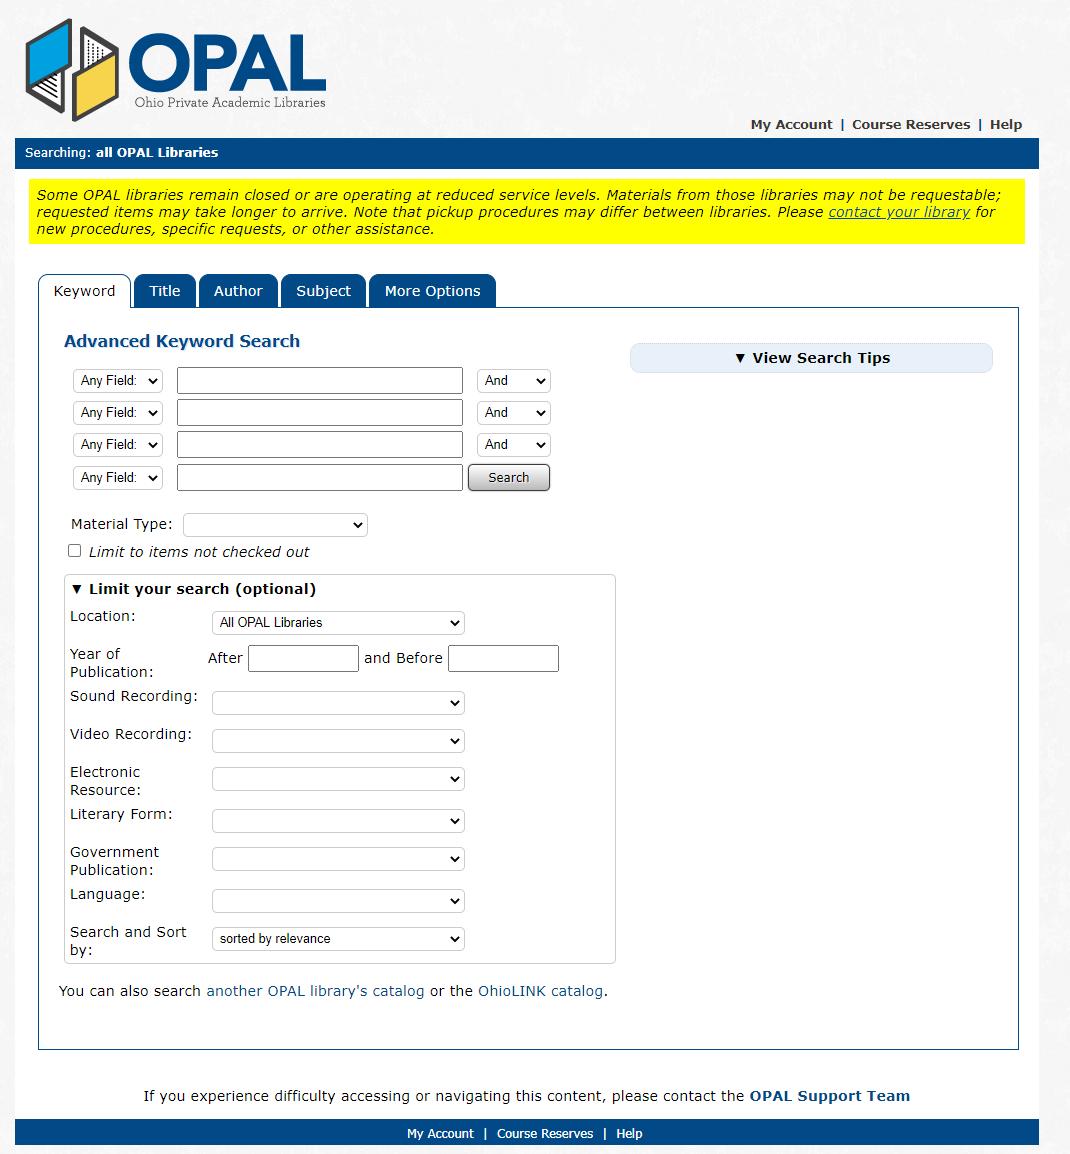 opal search page